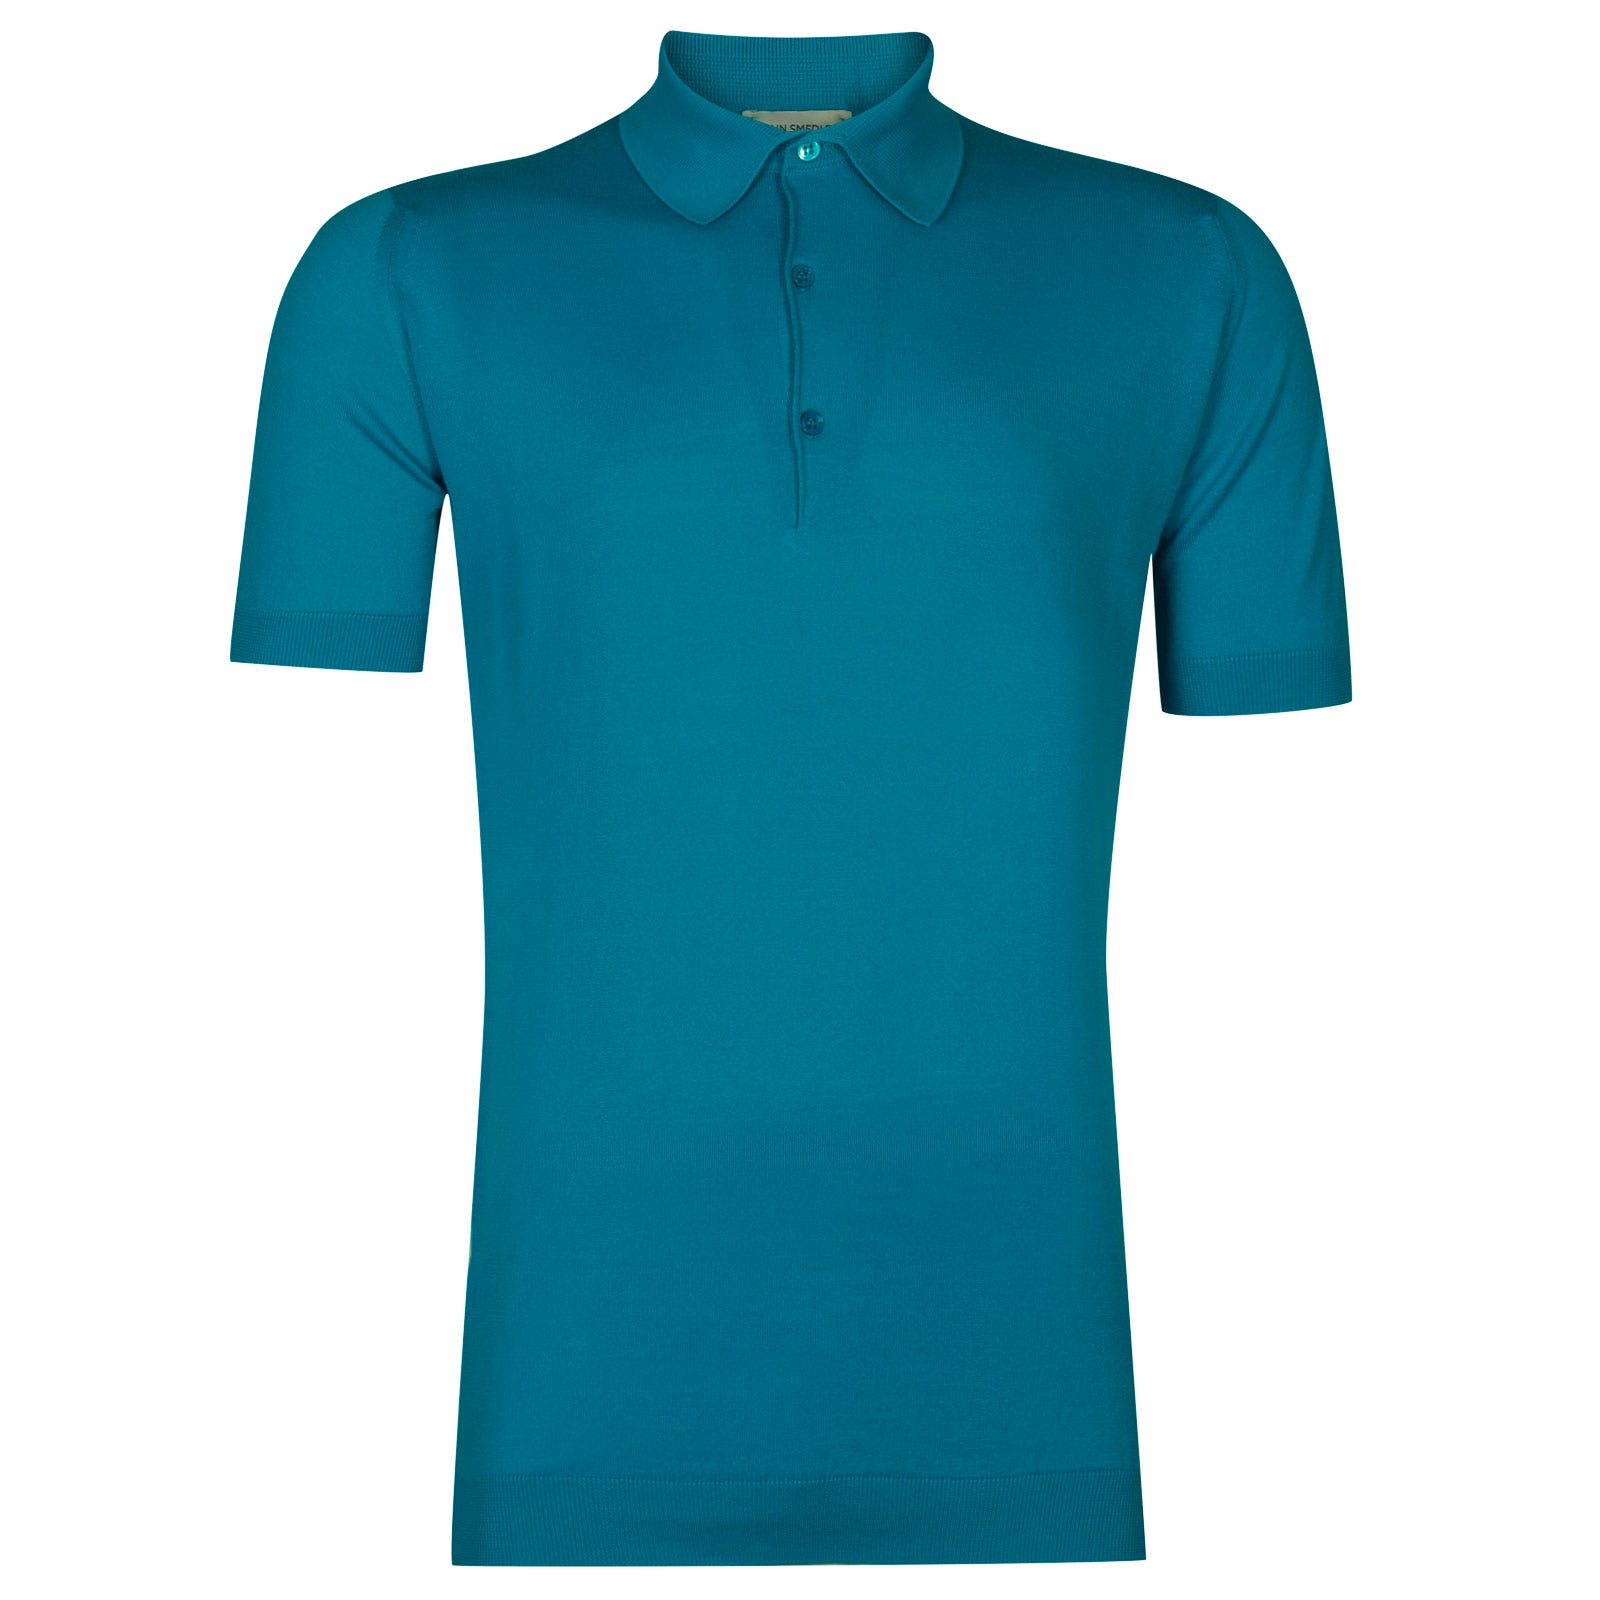 adrian-gaudi-blue-S